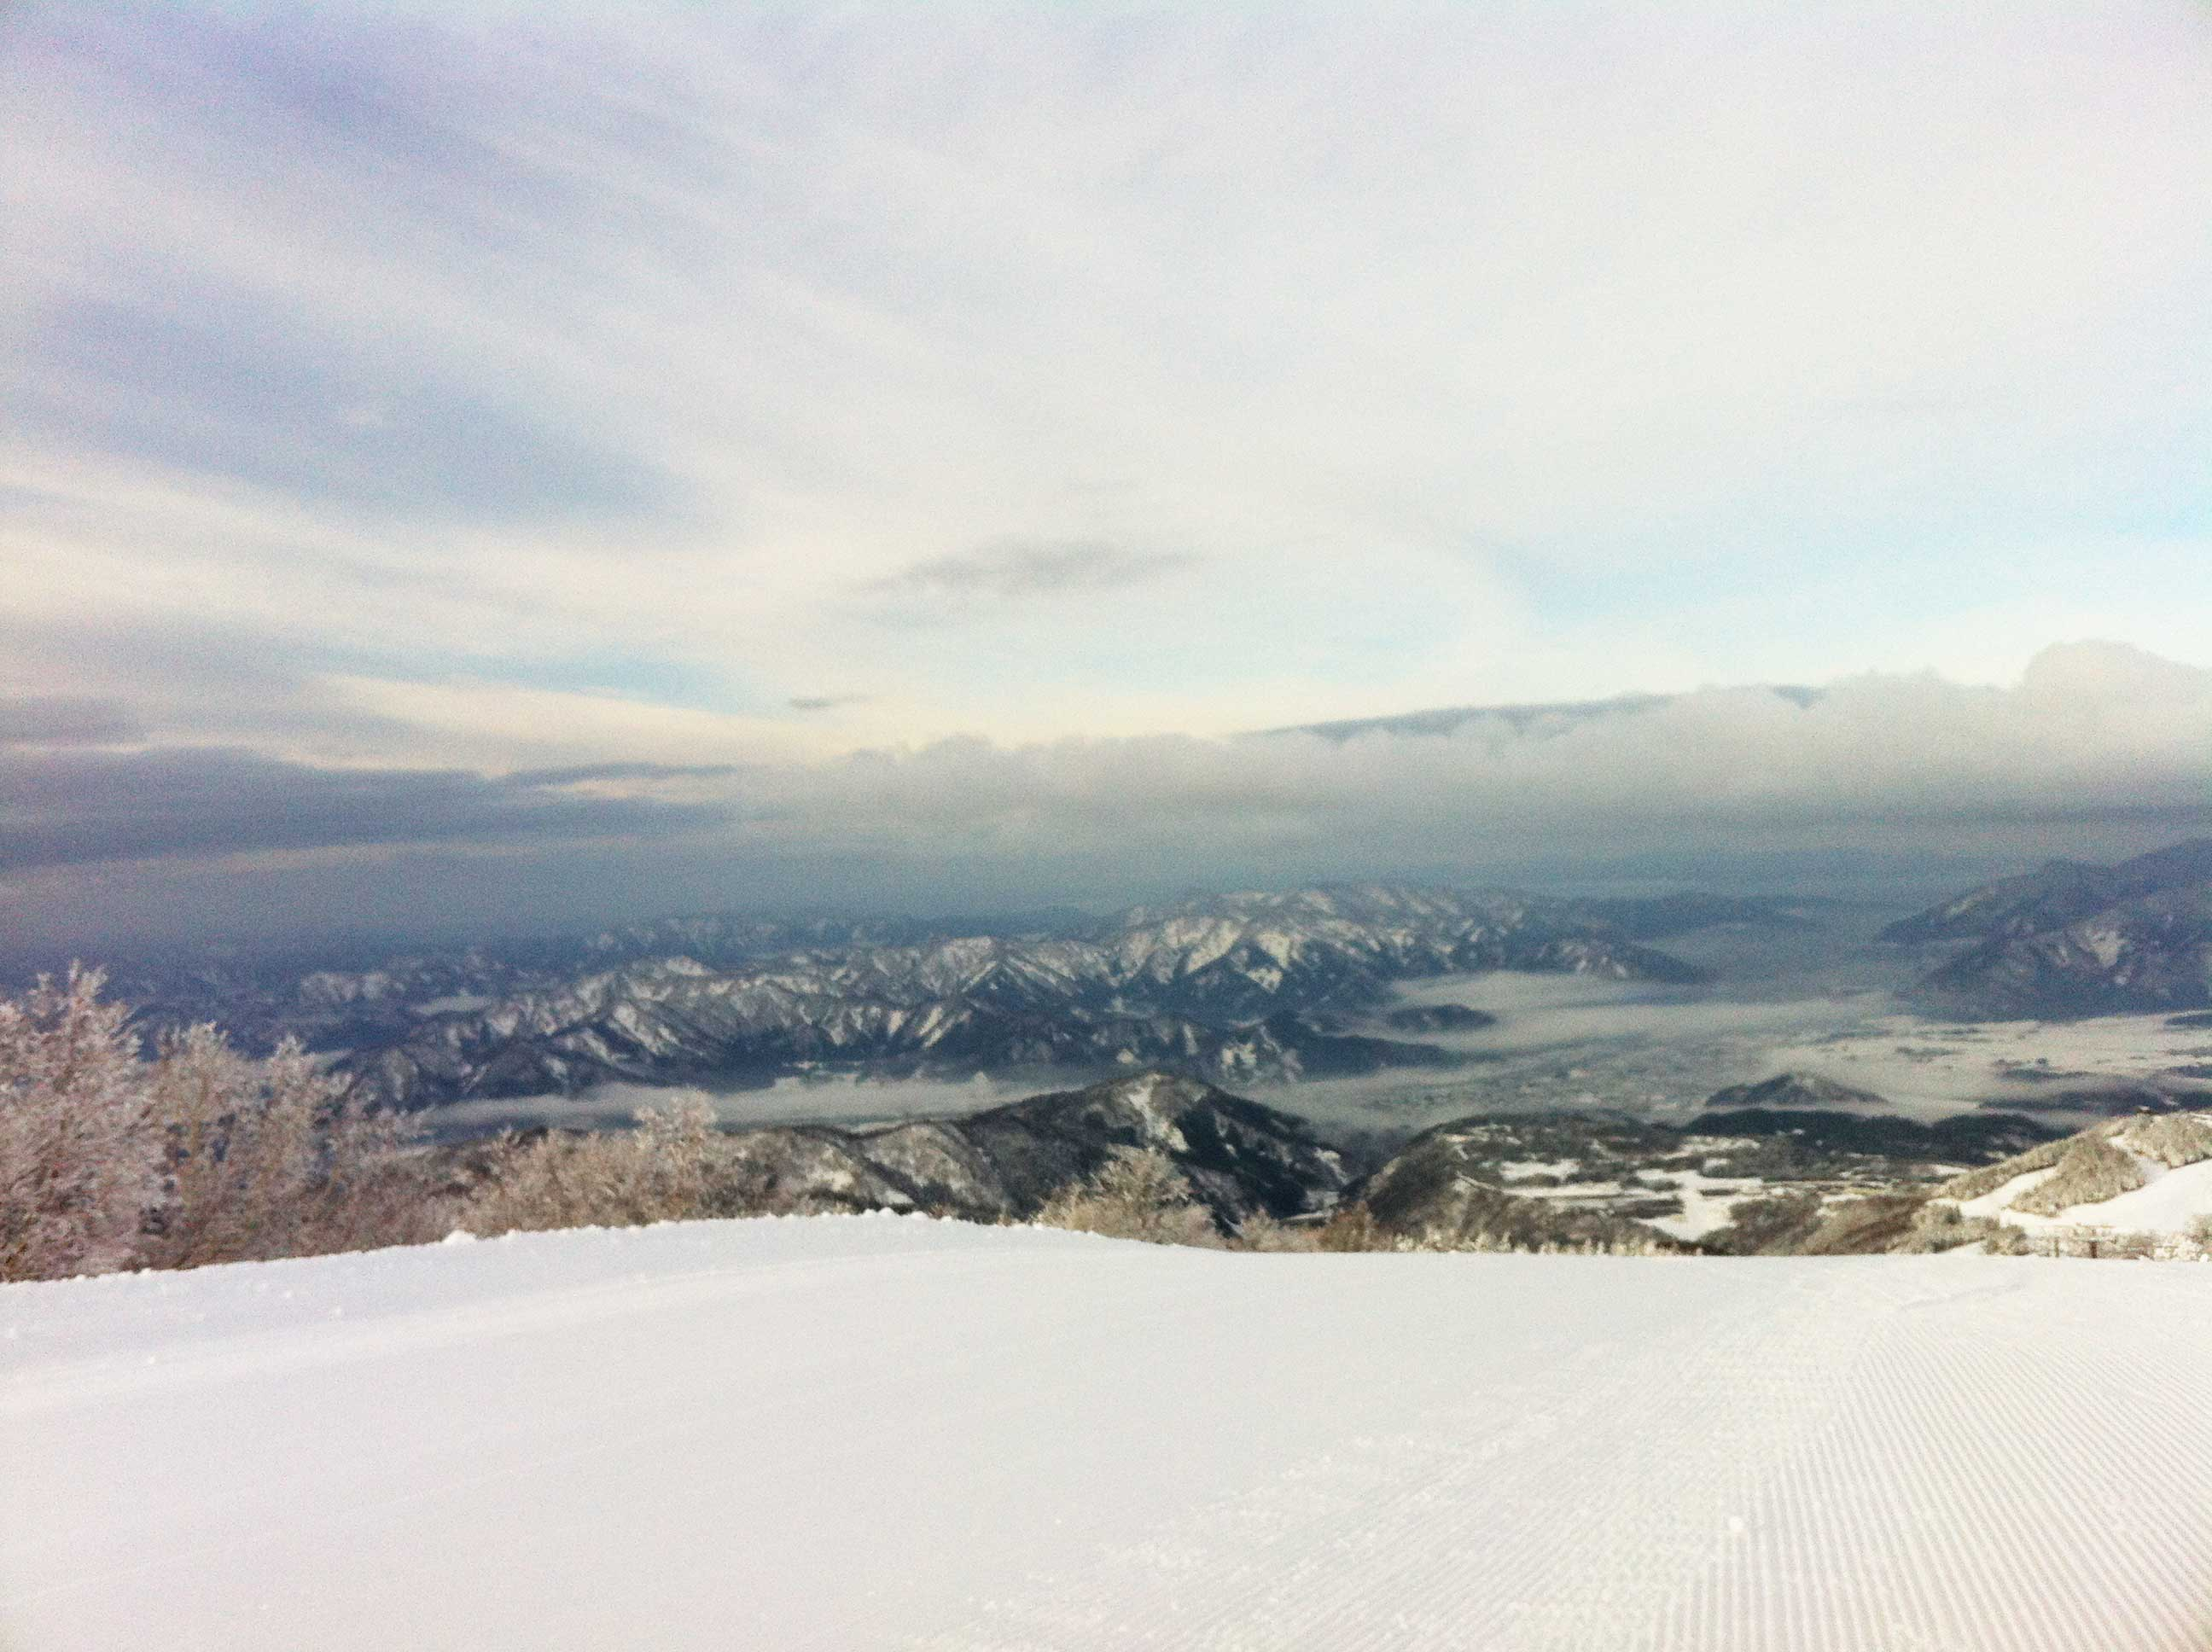 First snowboarding of the season_a0059209_1303738.jpg